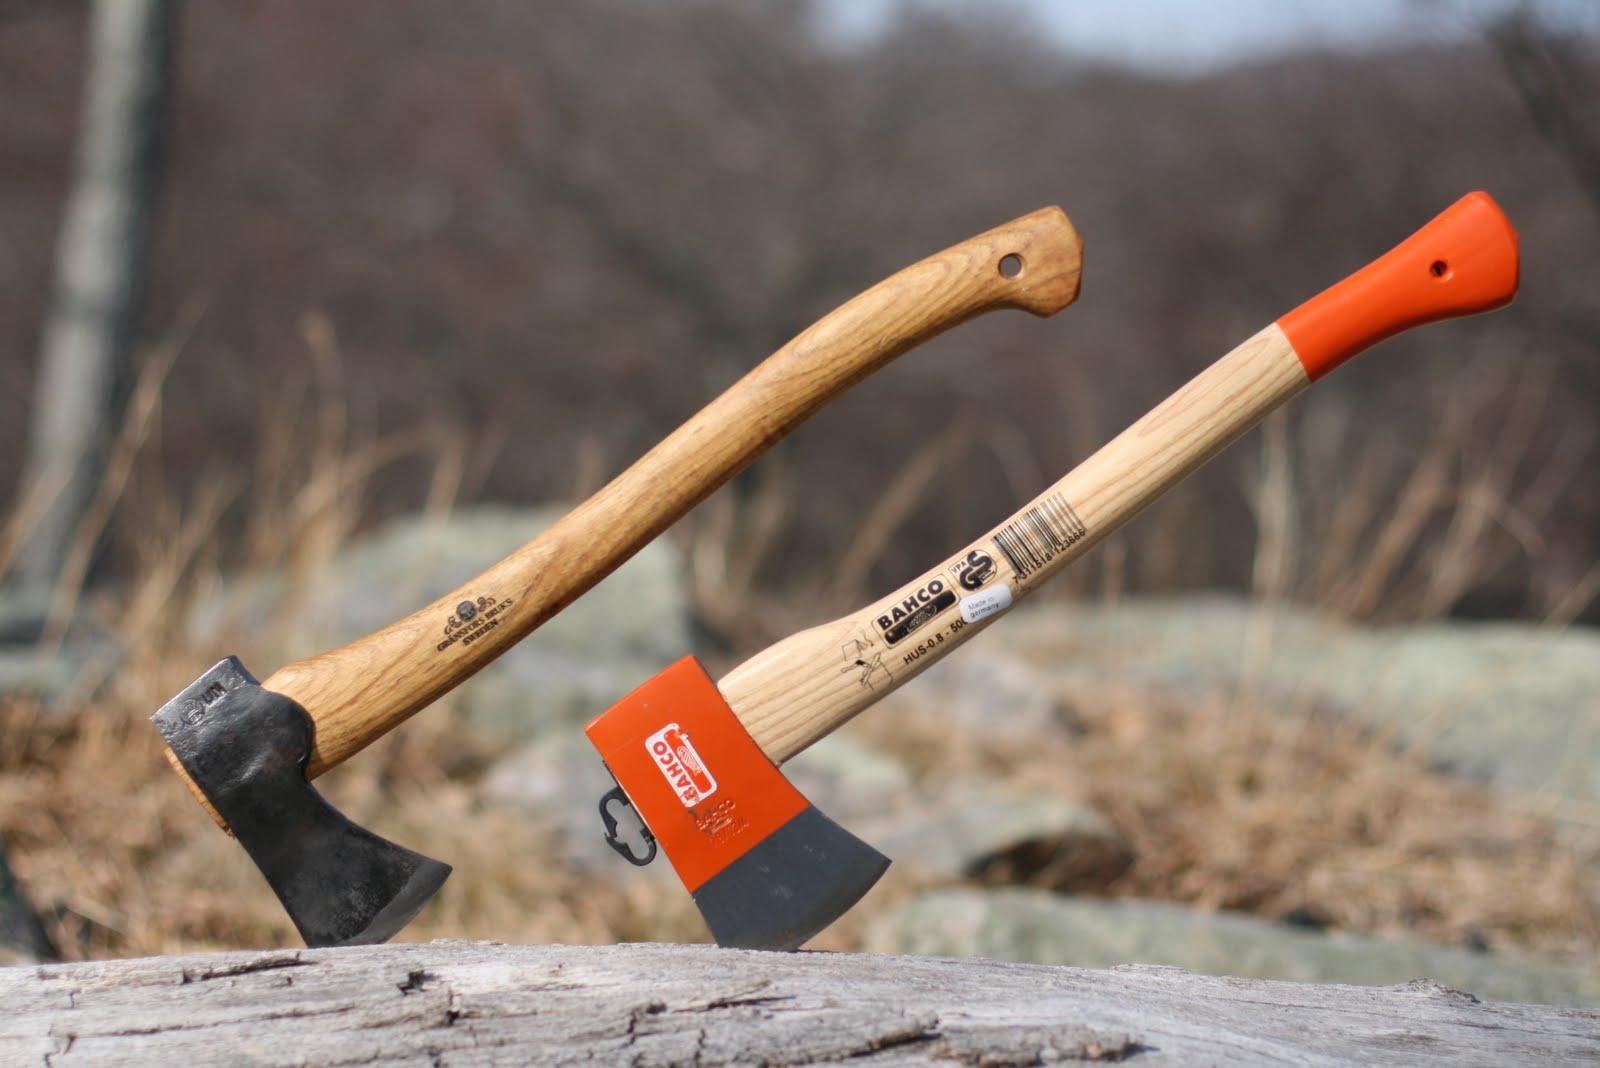 Wood Trekker Bahco Sandvik 19 Inch Rucksack Axe Review